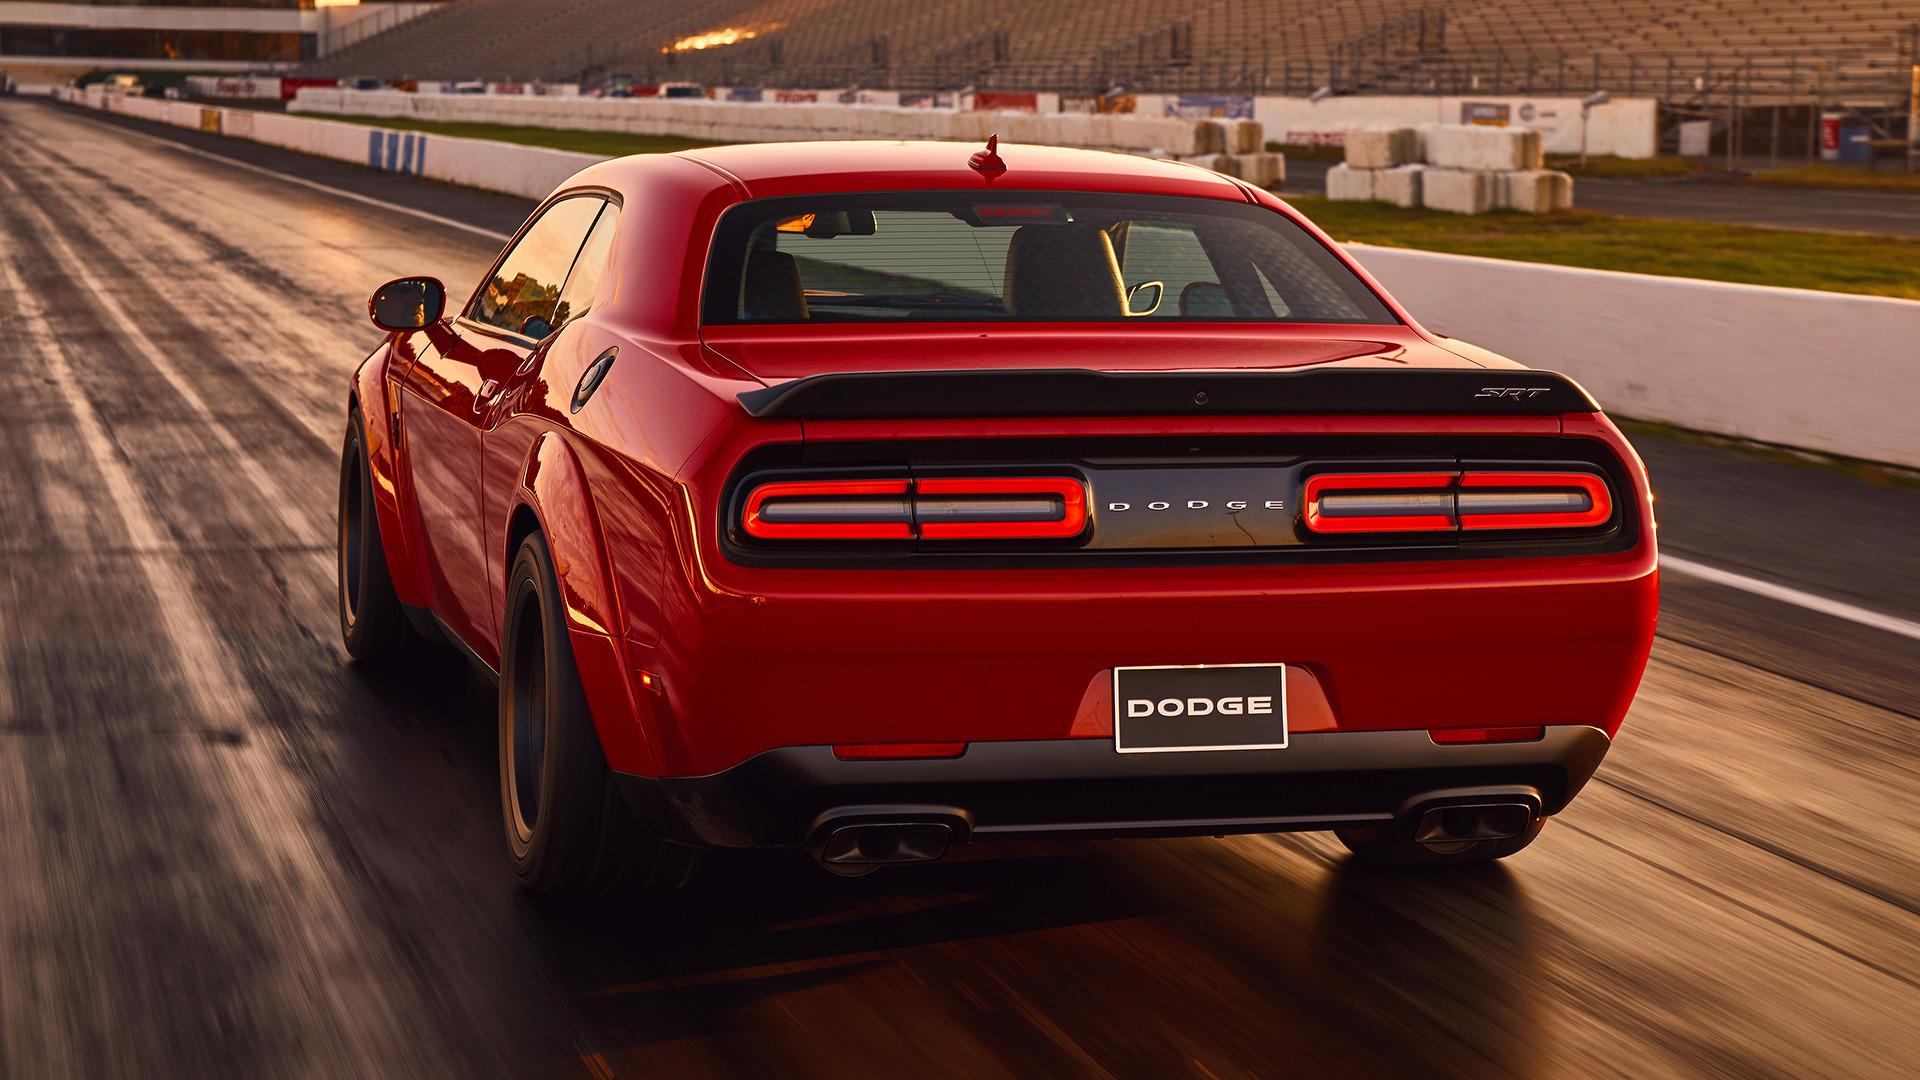 Dodge Challenger Srt Demon Officially Revealed Video